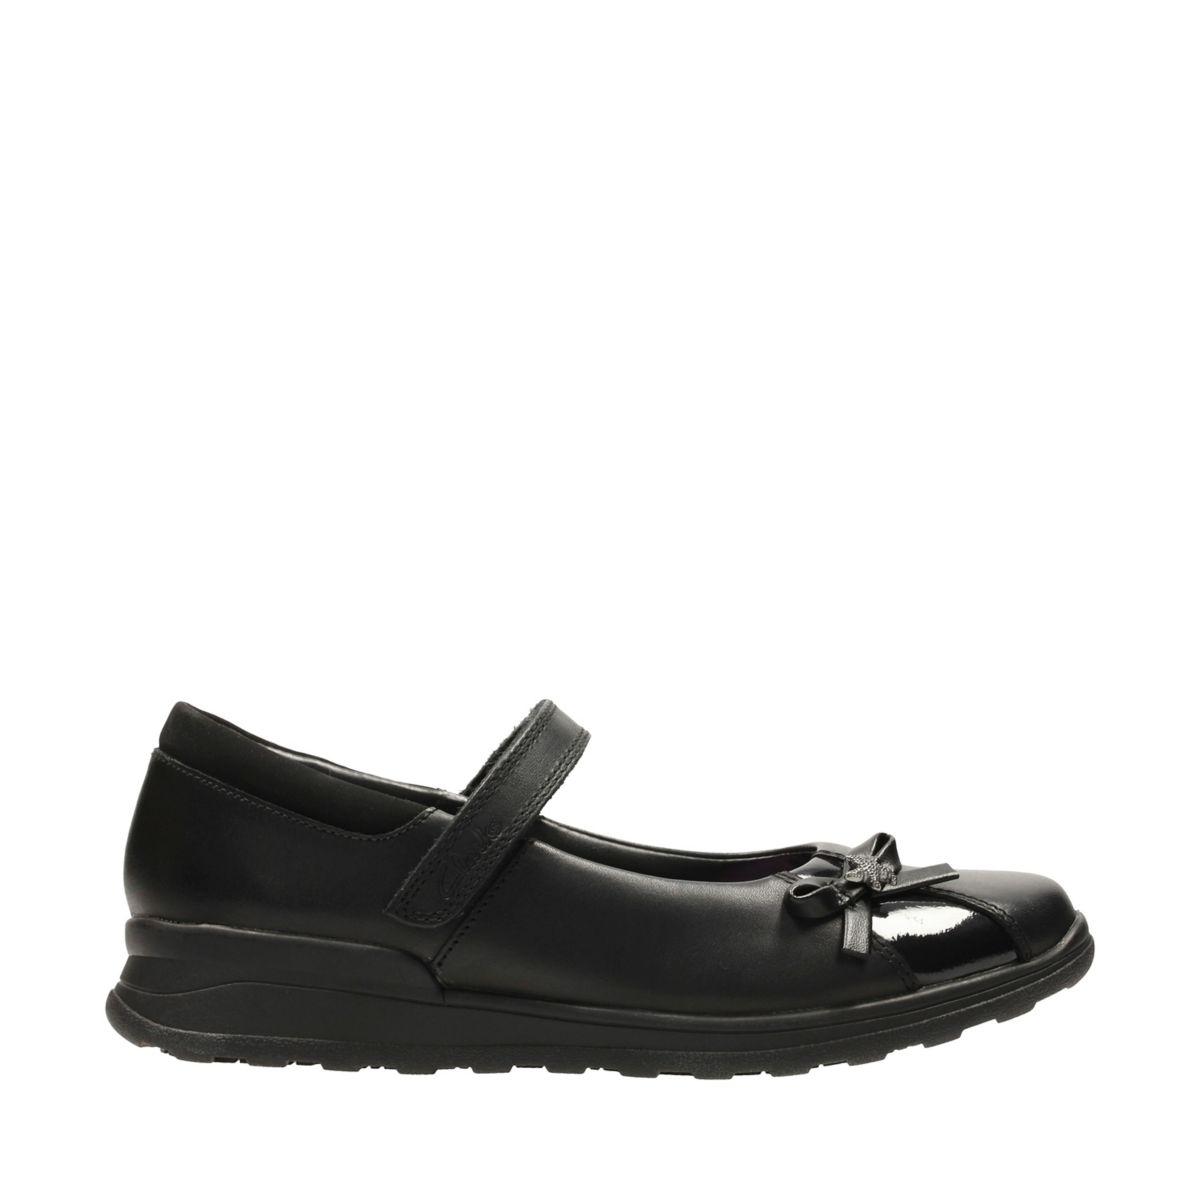 Clarks MarielWish Jnr Girl's School Shoes 2 E Black Leather